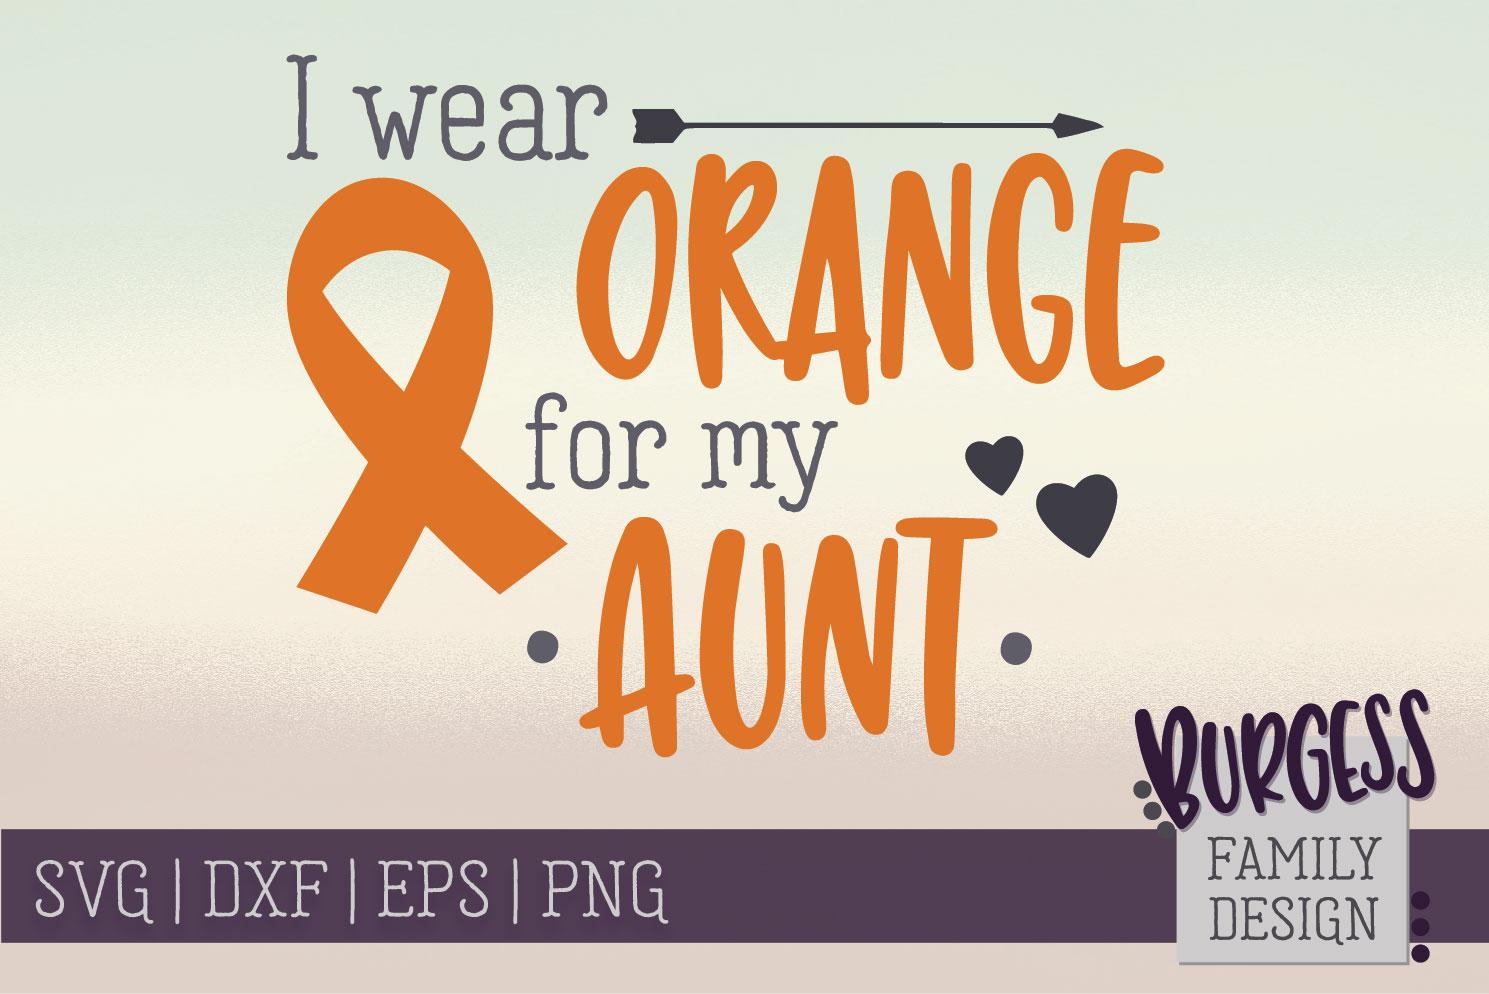 BUNDLE | I wear orange for my family | SVG DXF EPS PN example image 3